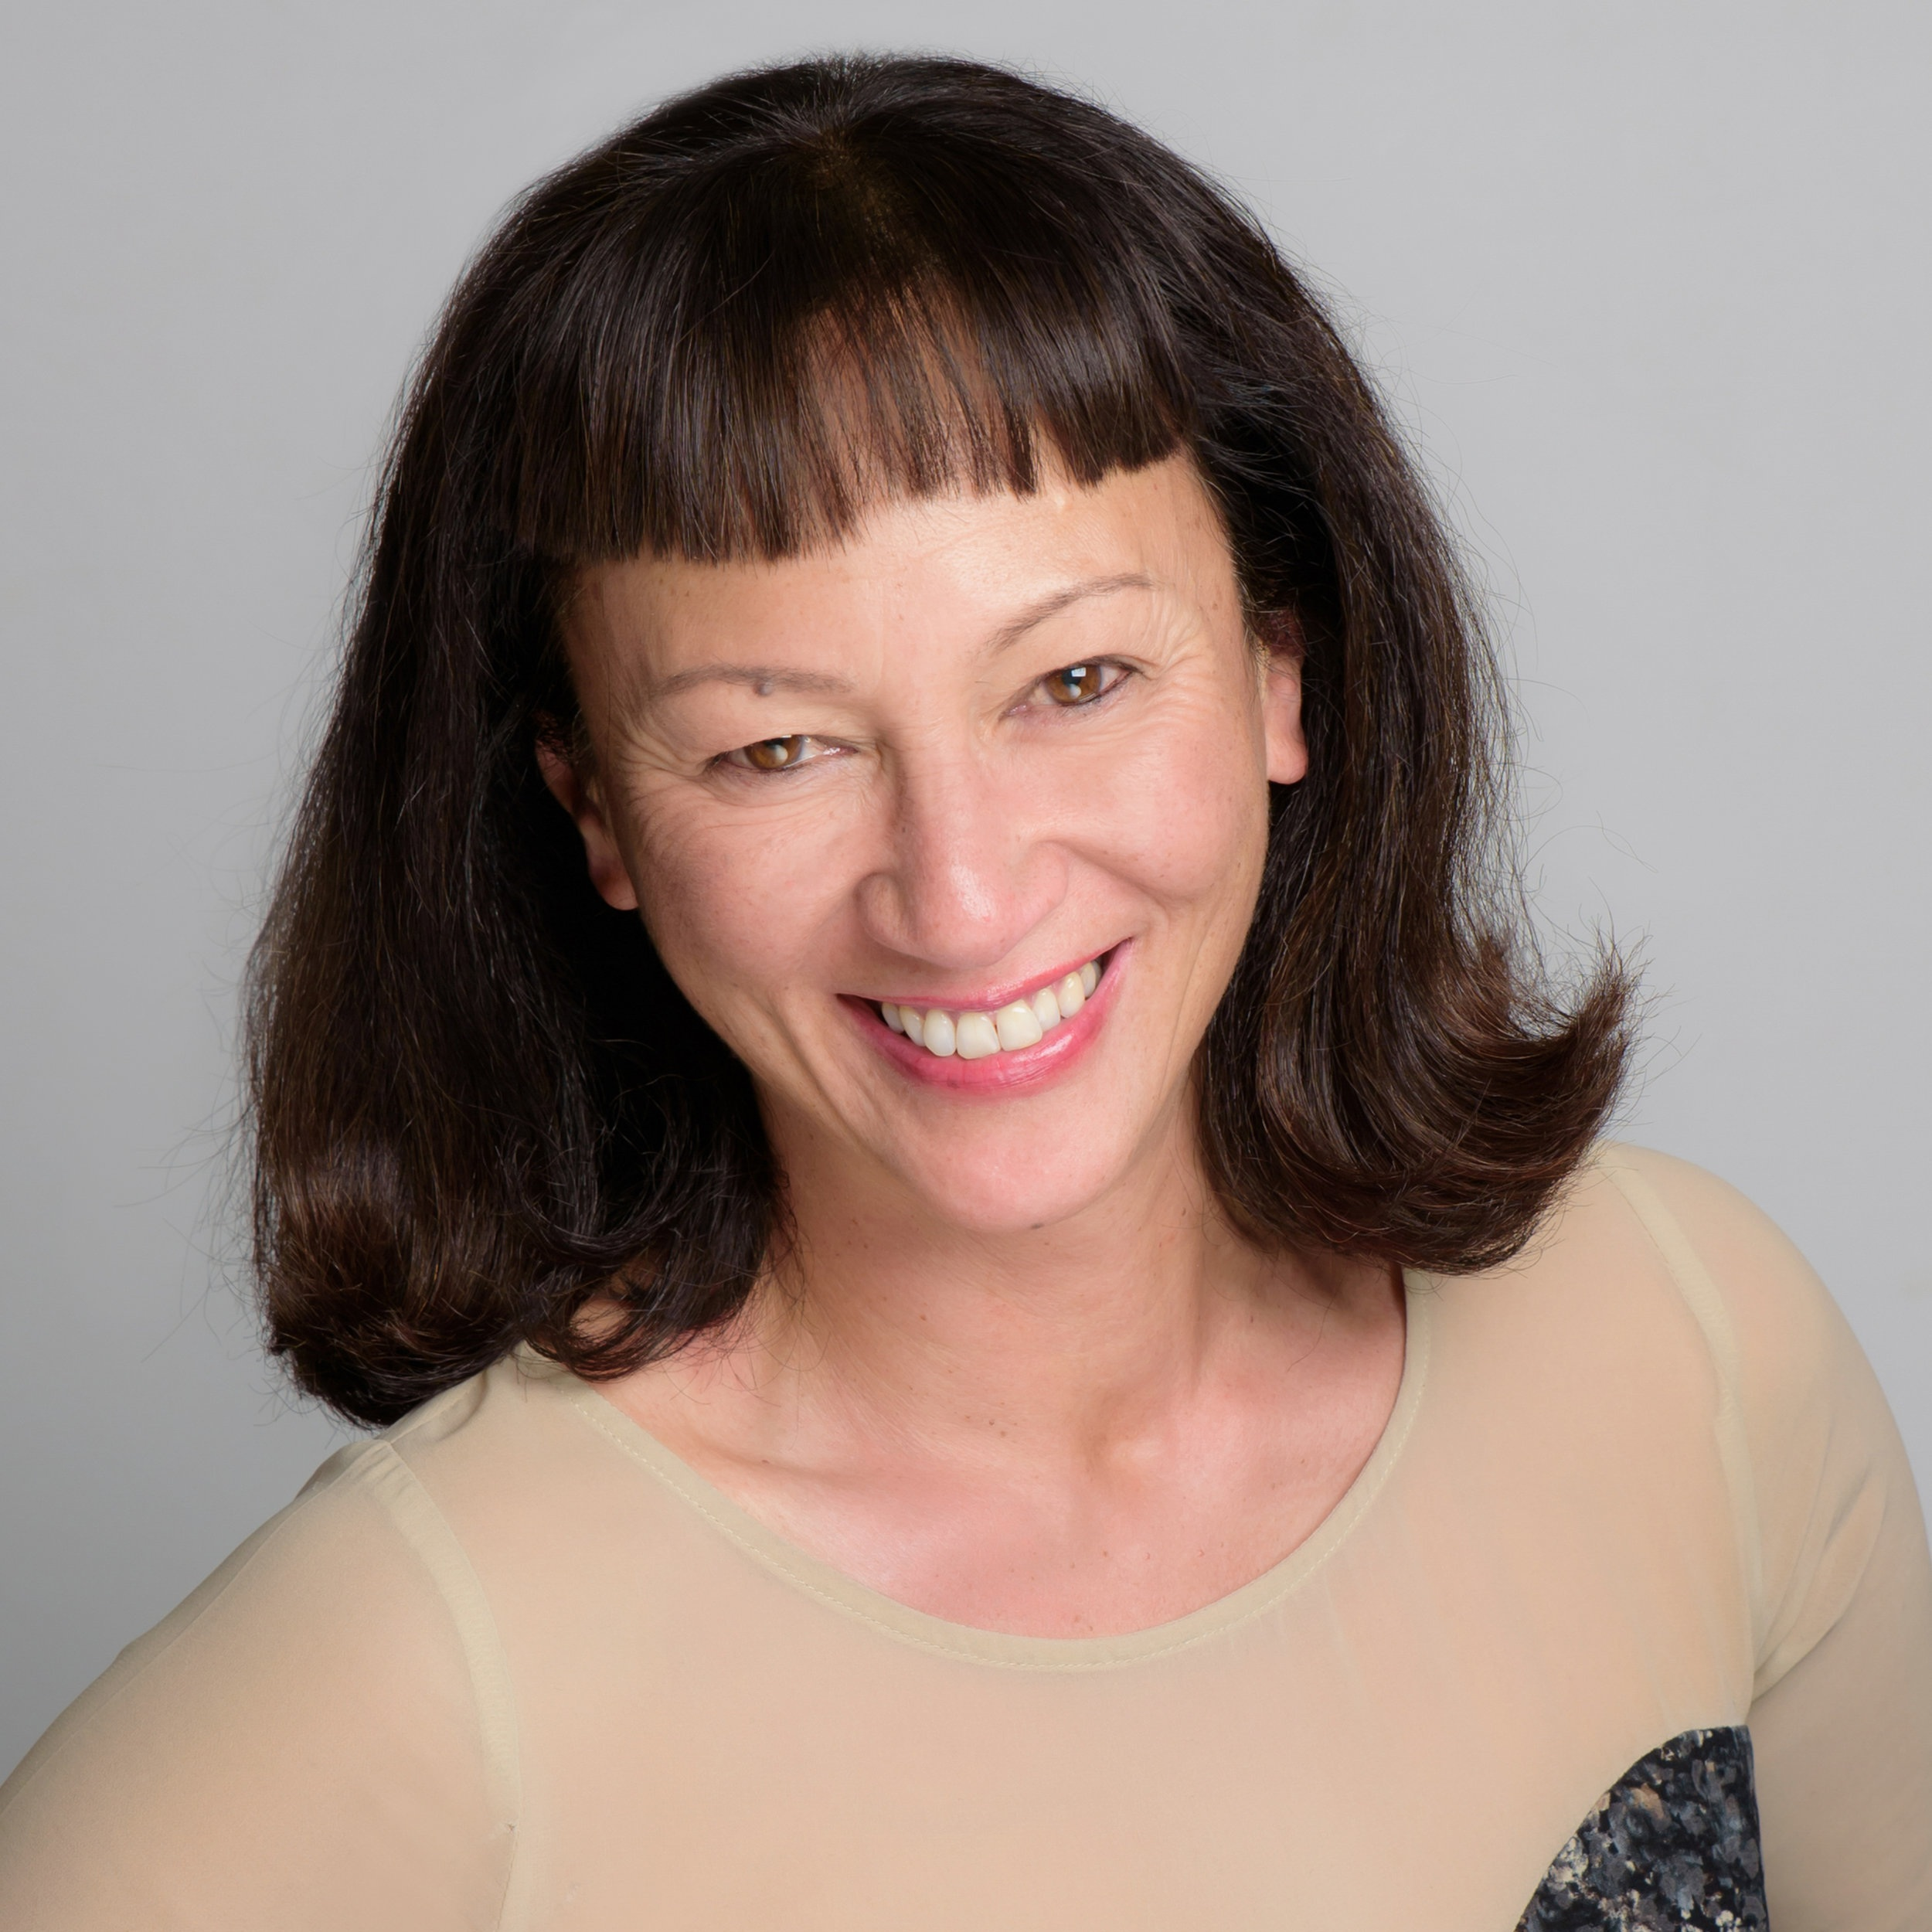 Karinia Lee -MInstD - Board Member